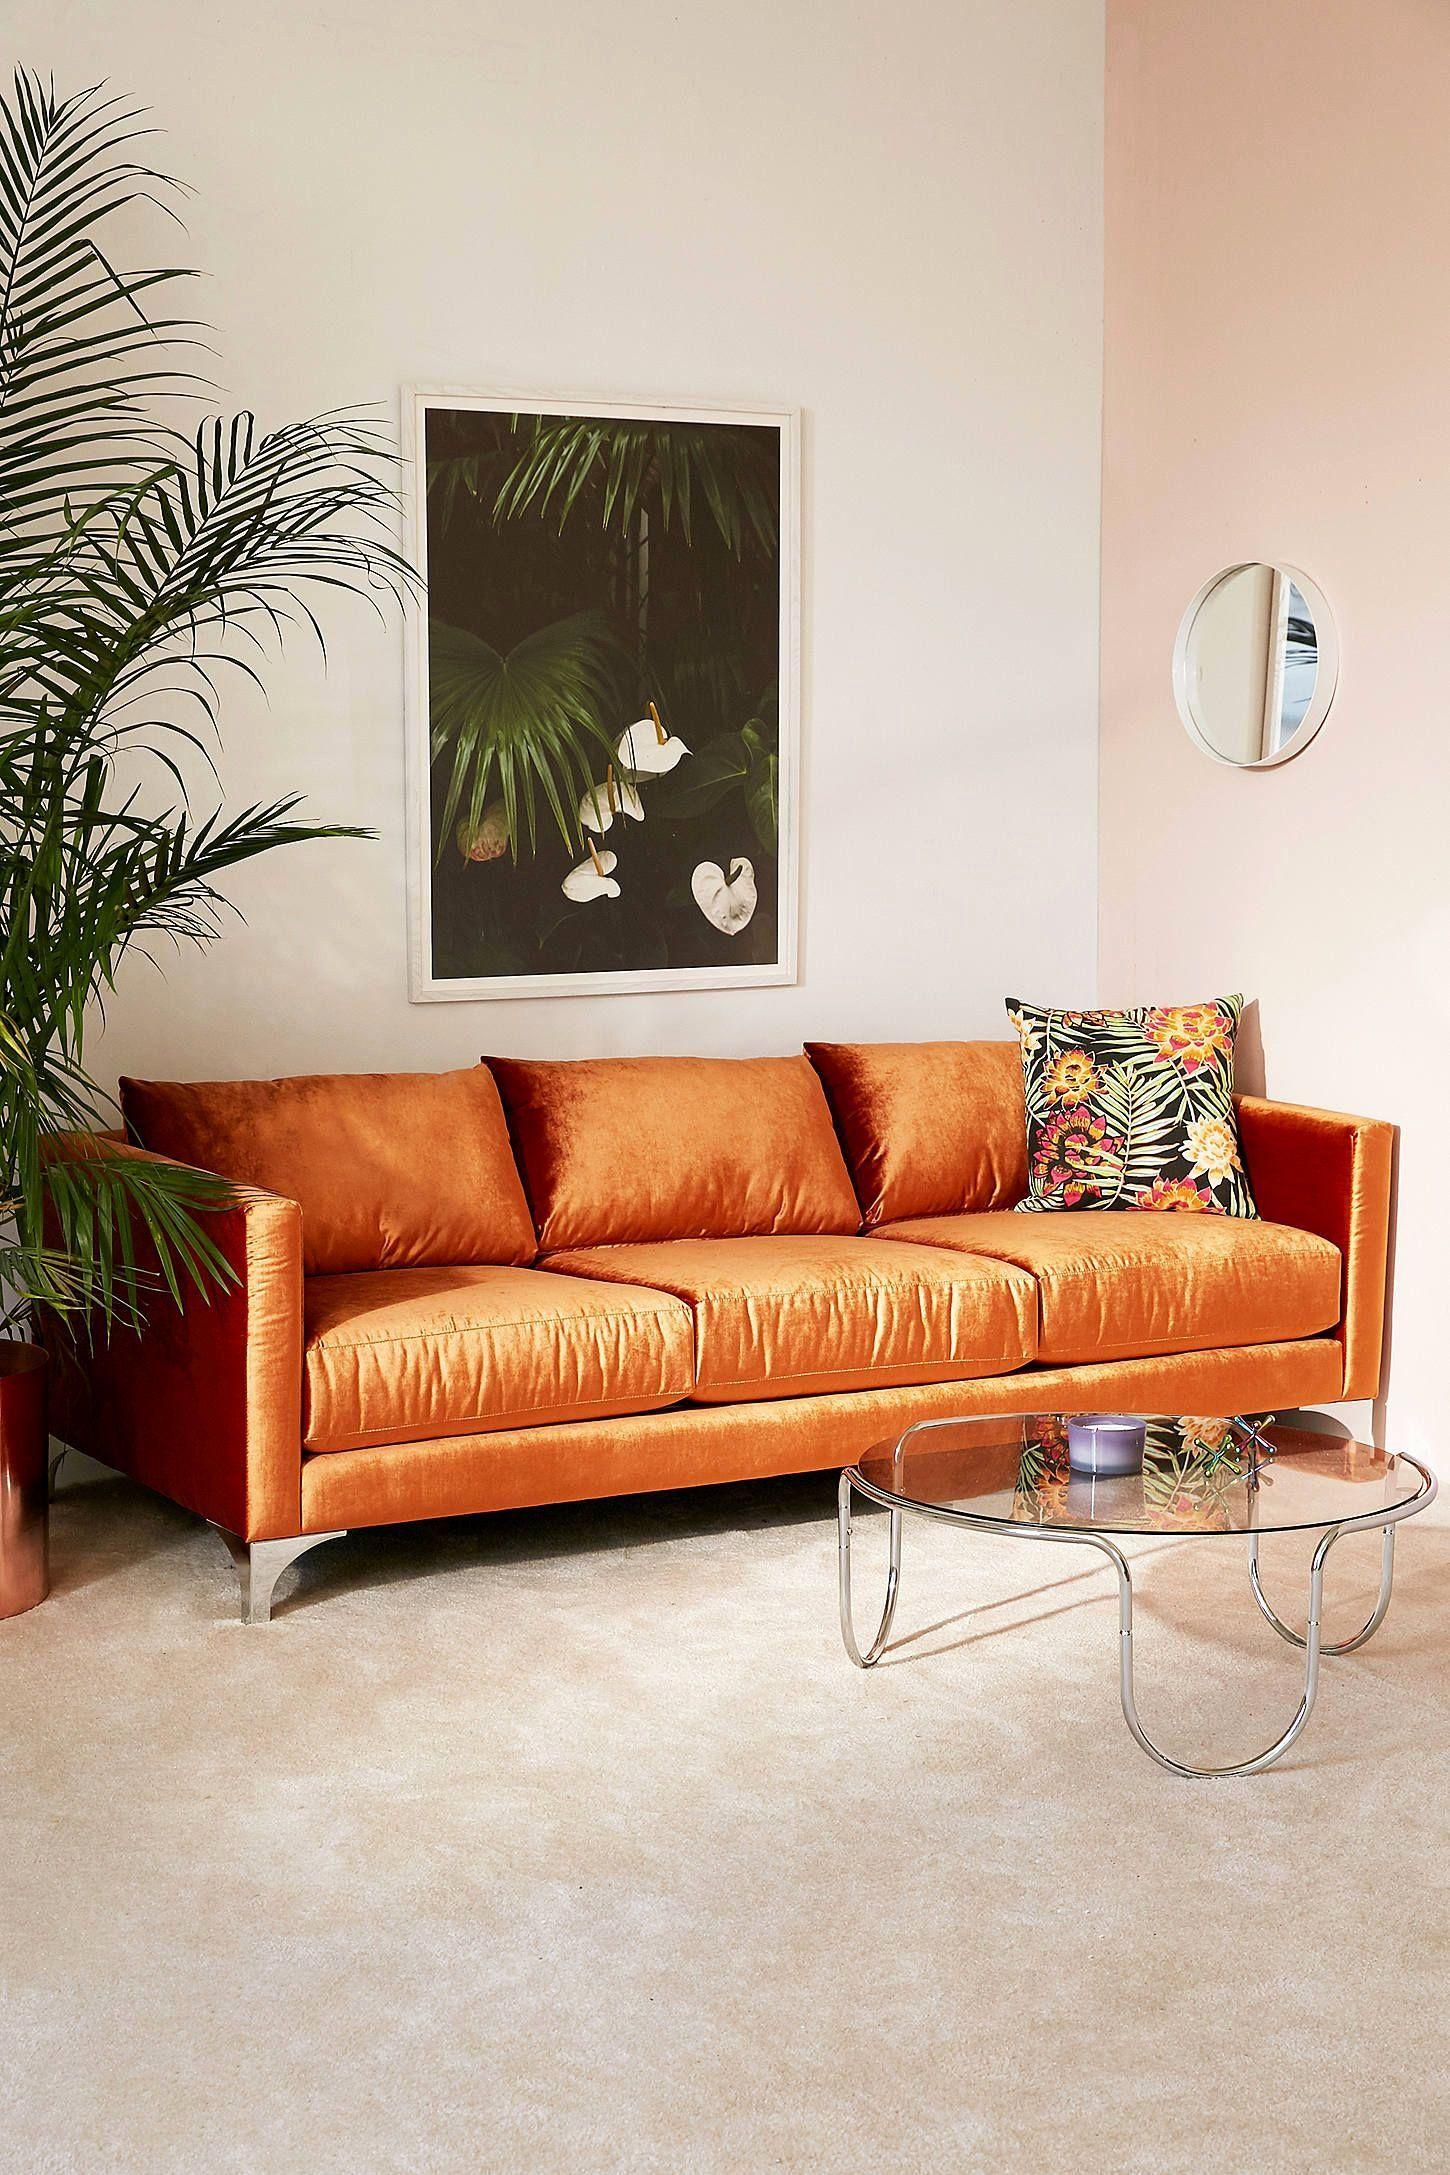 Pin en Orange sofa deco ideas